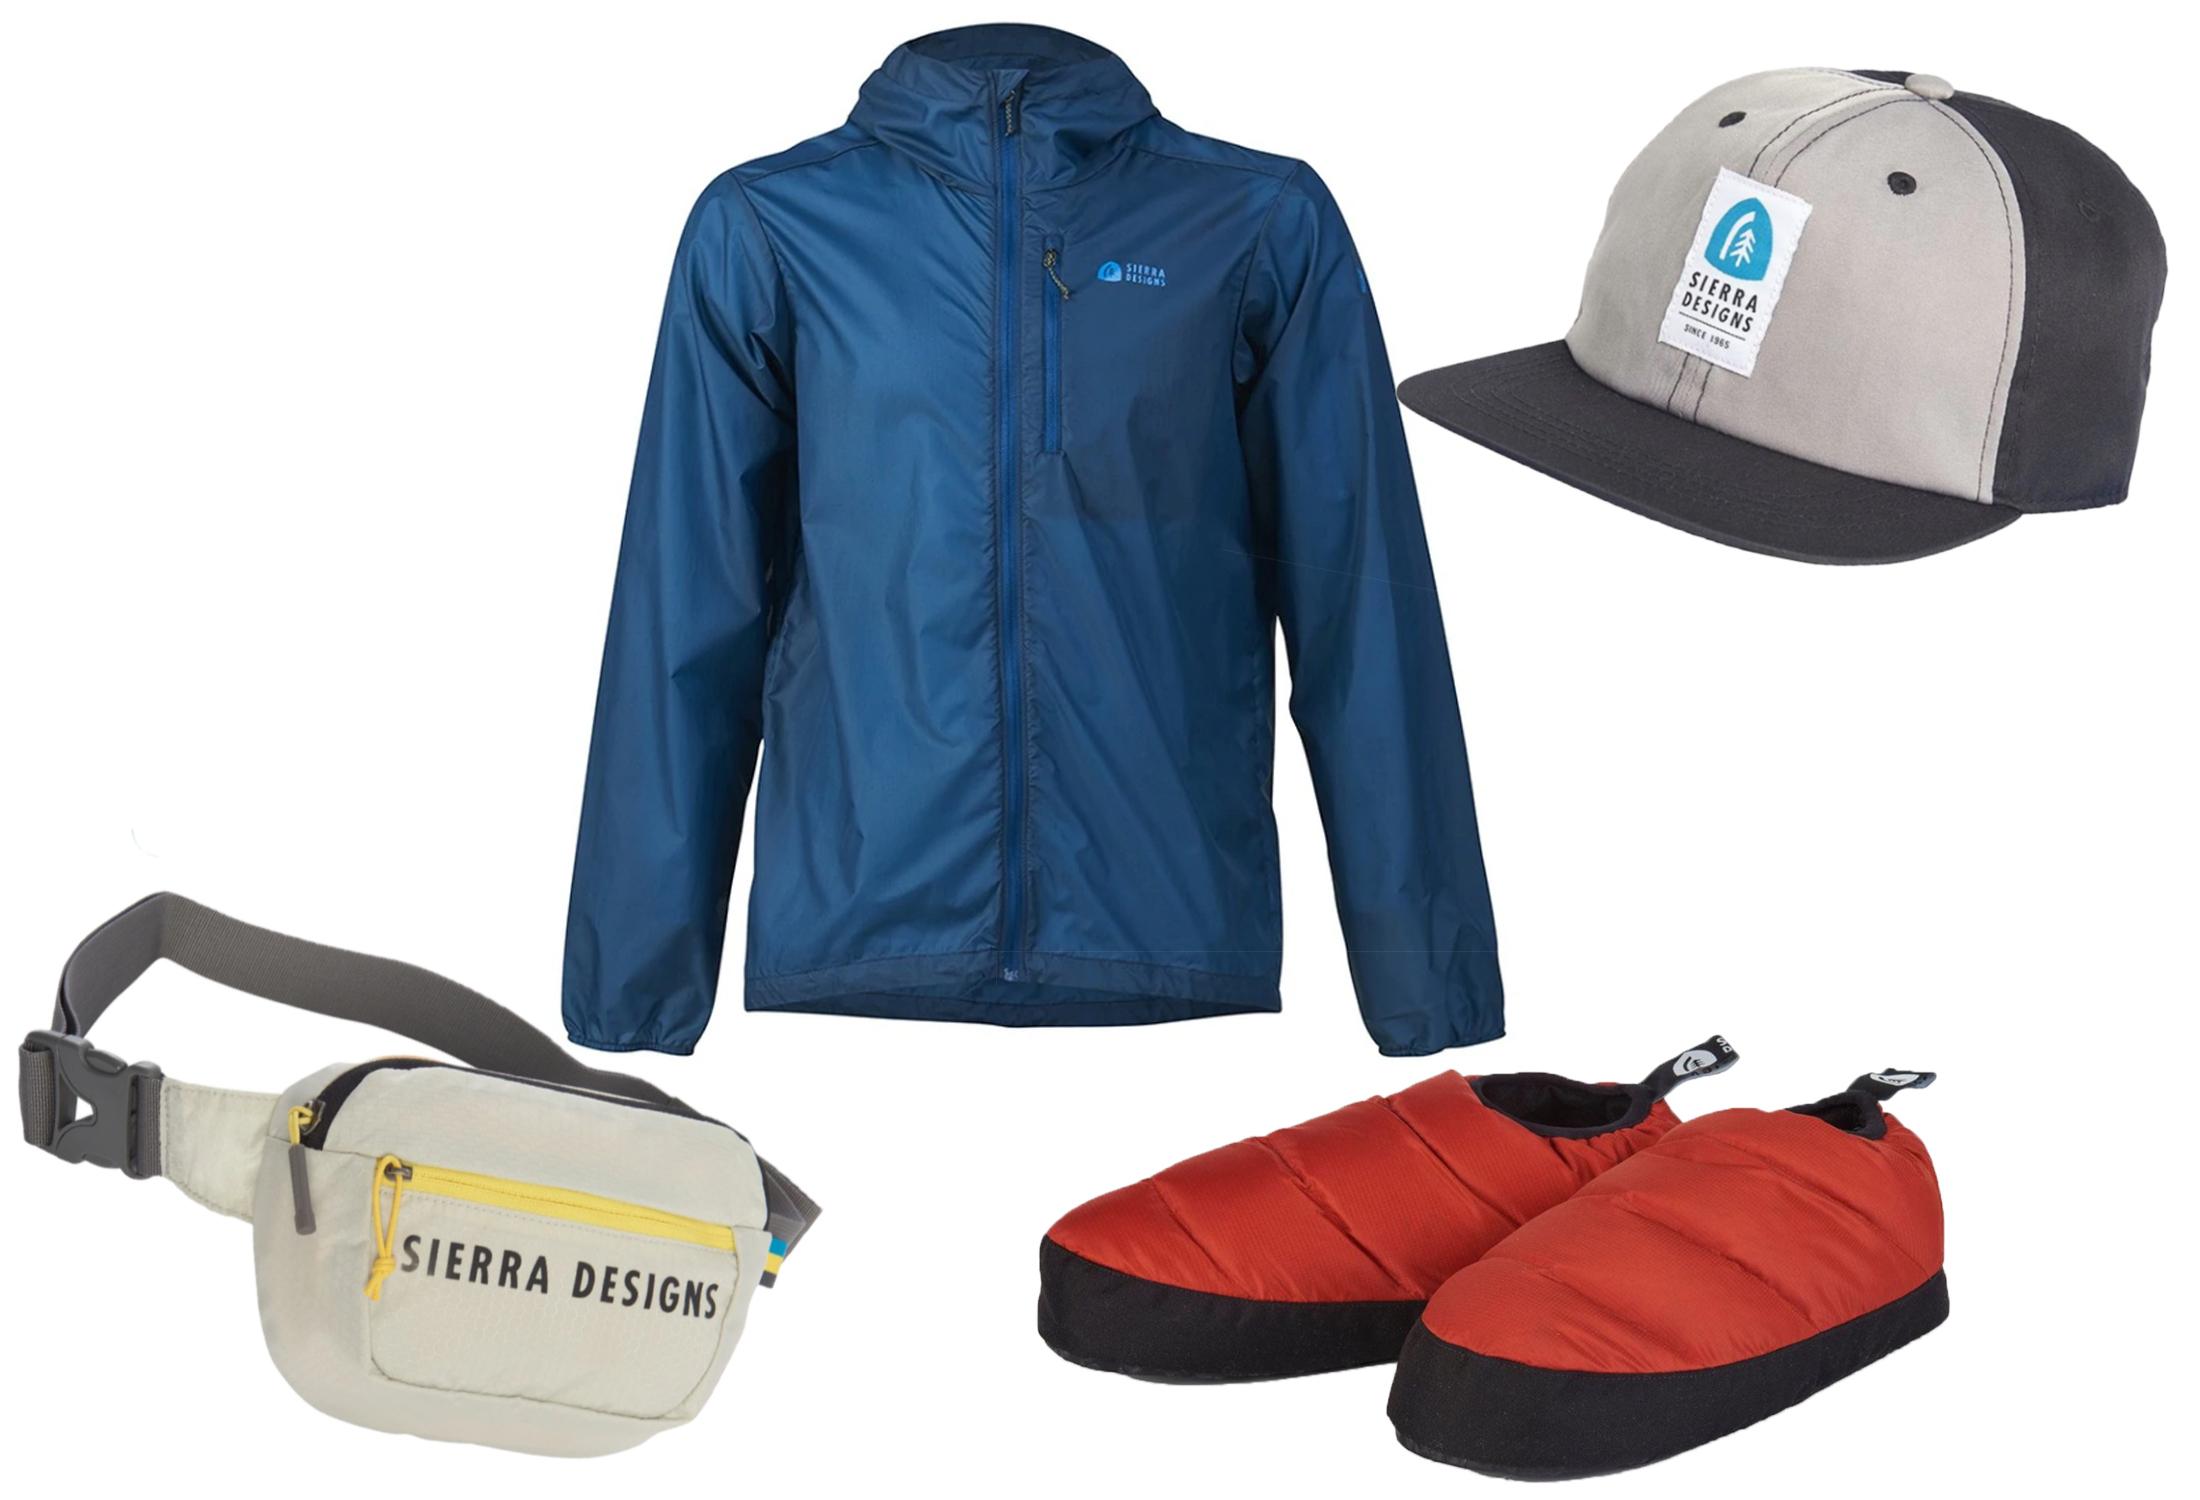 Sierra designs equipment gifts